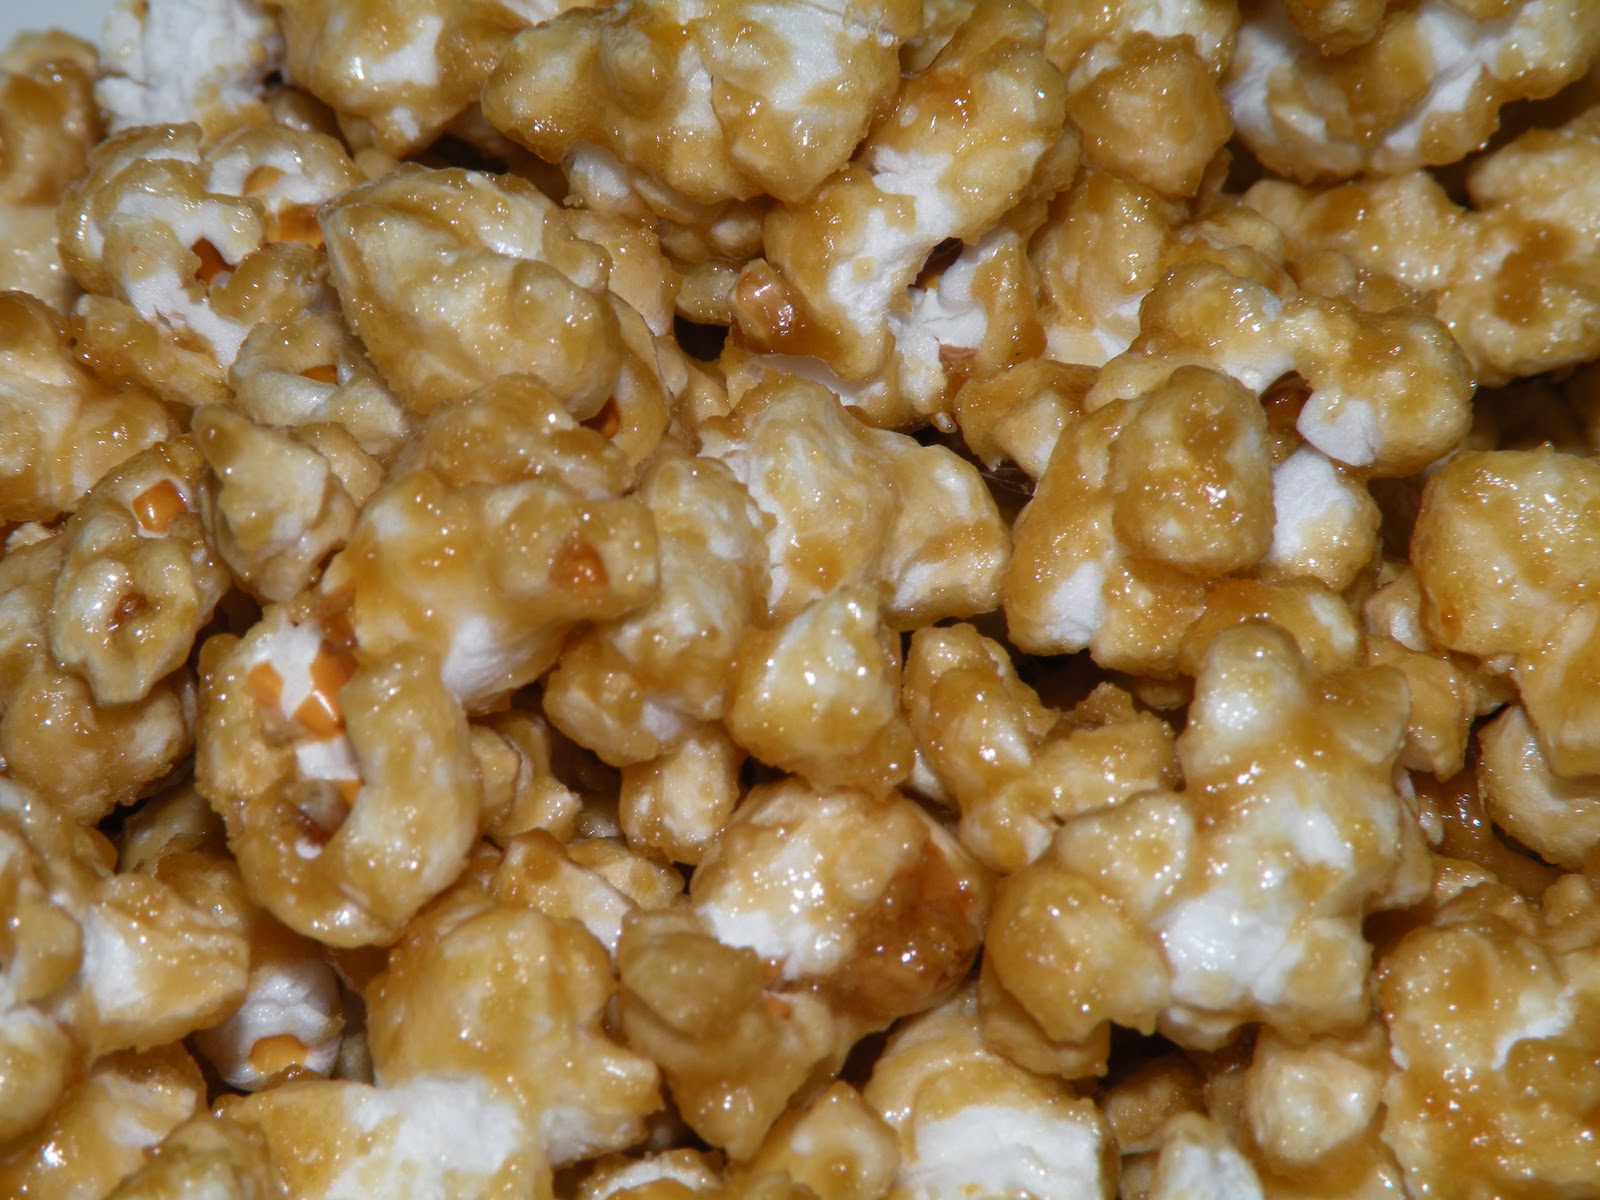 Heart, Hands, Home: Movie Night Caramel Corn